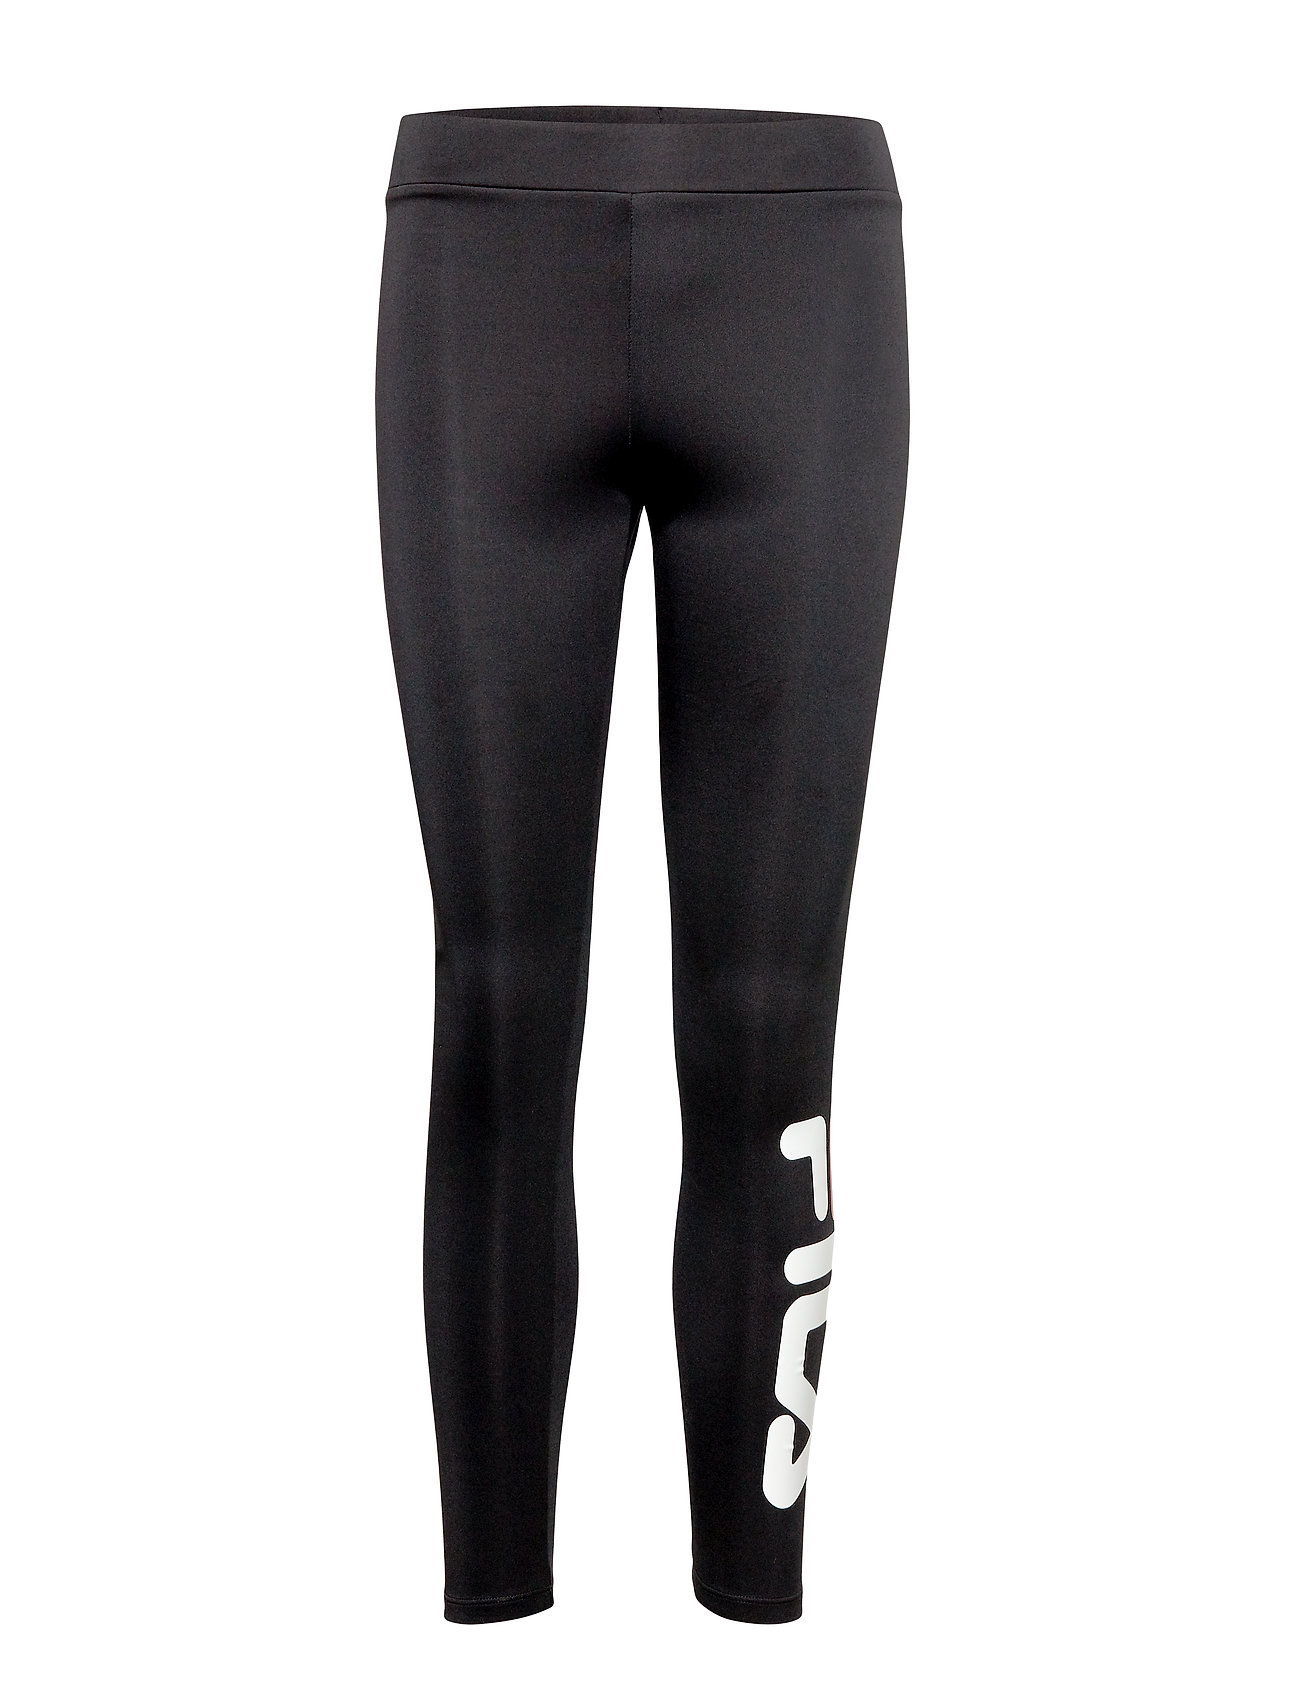 FILA WOMEN FLEX 2.0 leggings - BLACK